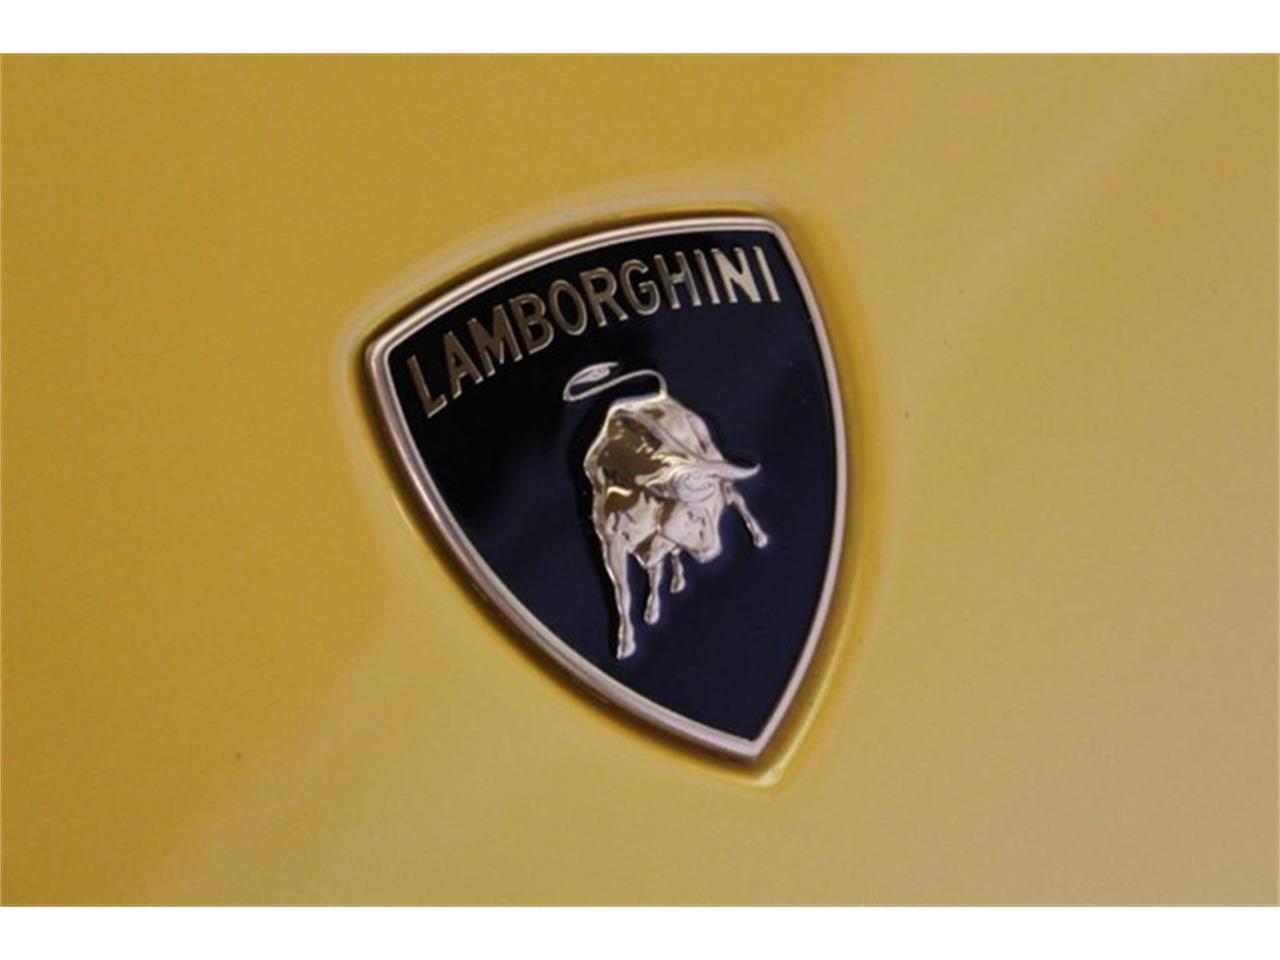 Large Picture of '07 Lamborghini Murcielago located in California - $165,900.00 Offered by DC Motors - L7IL